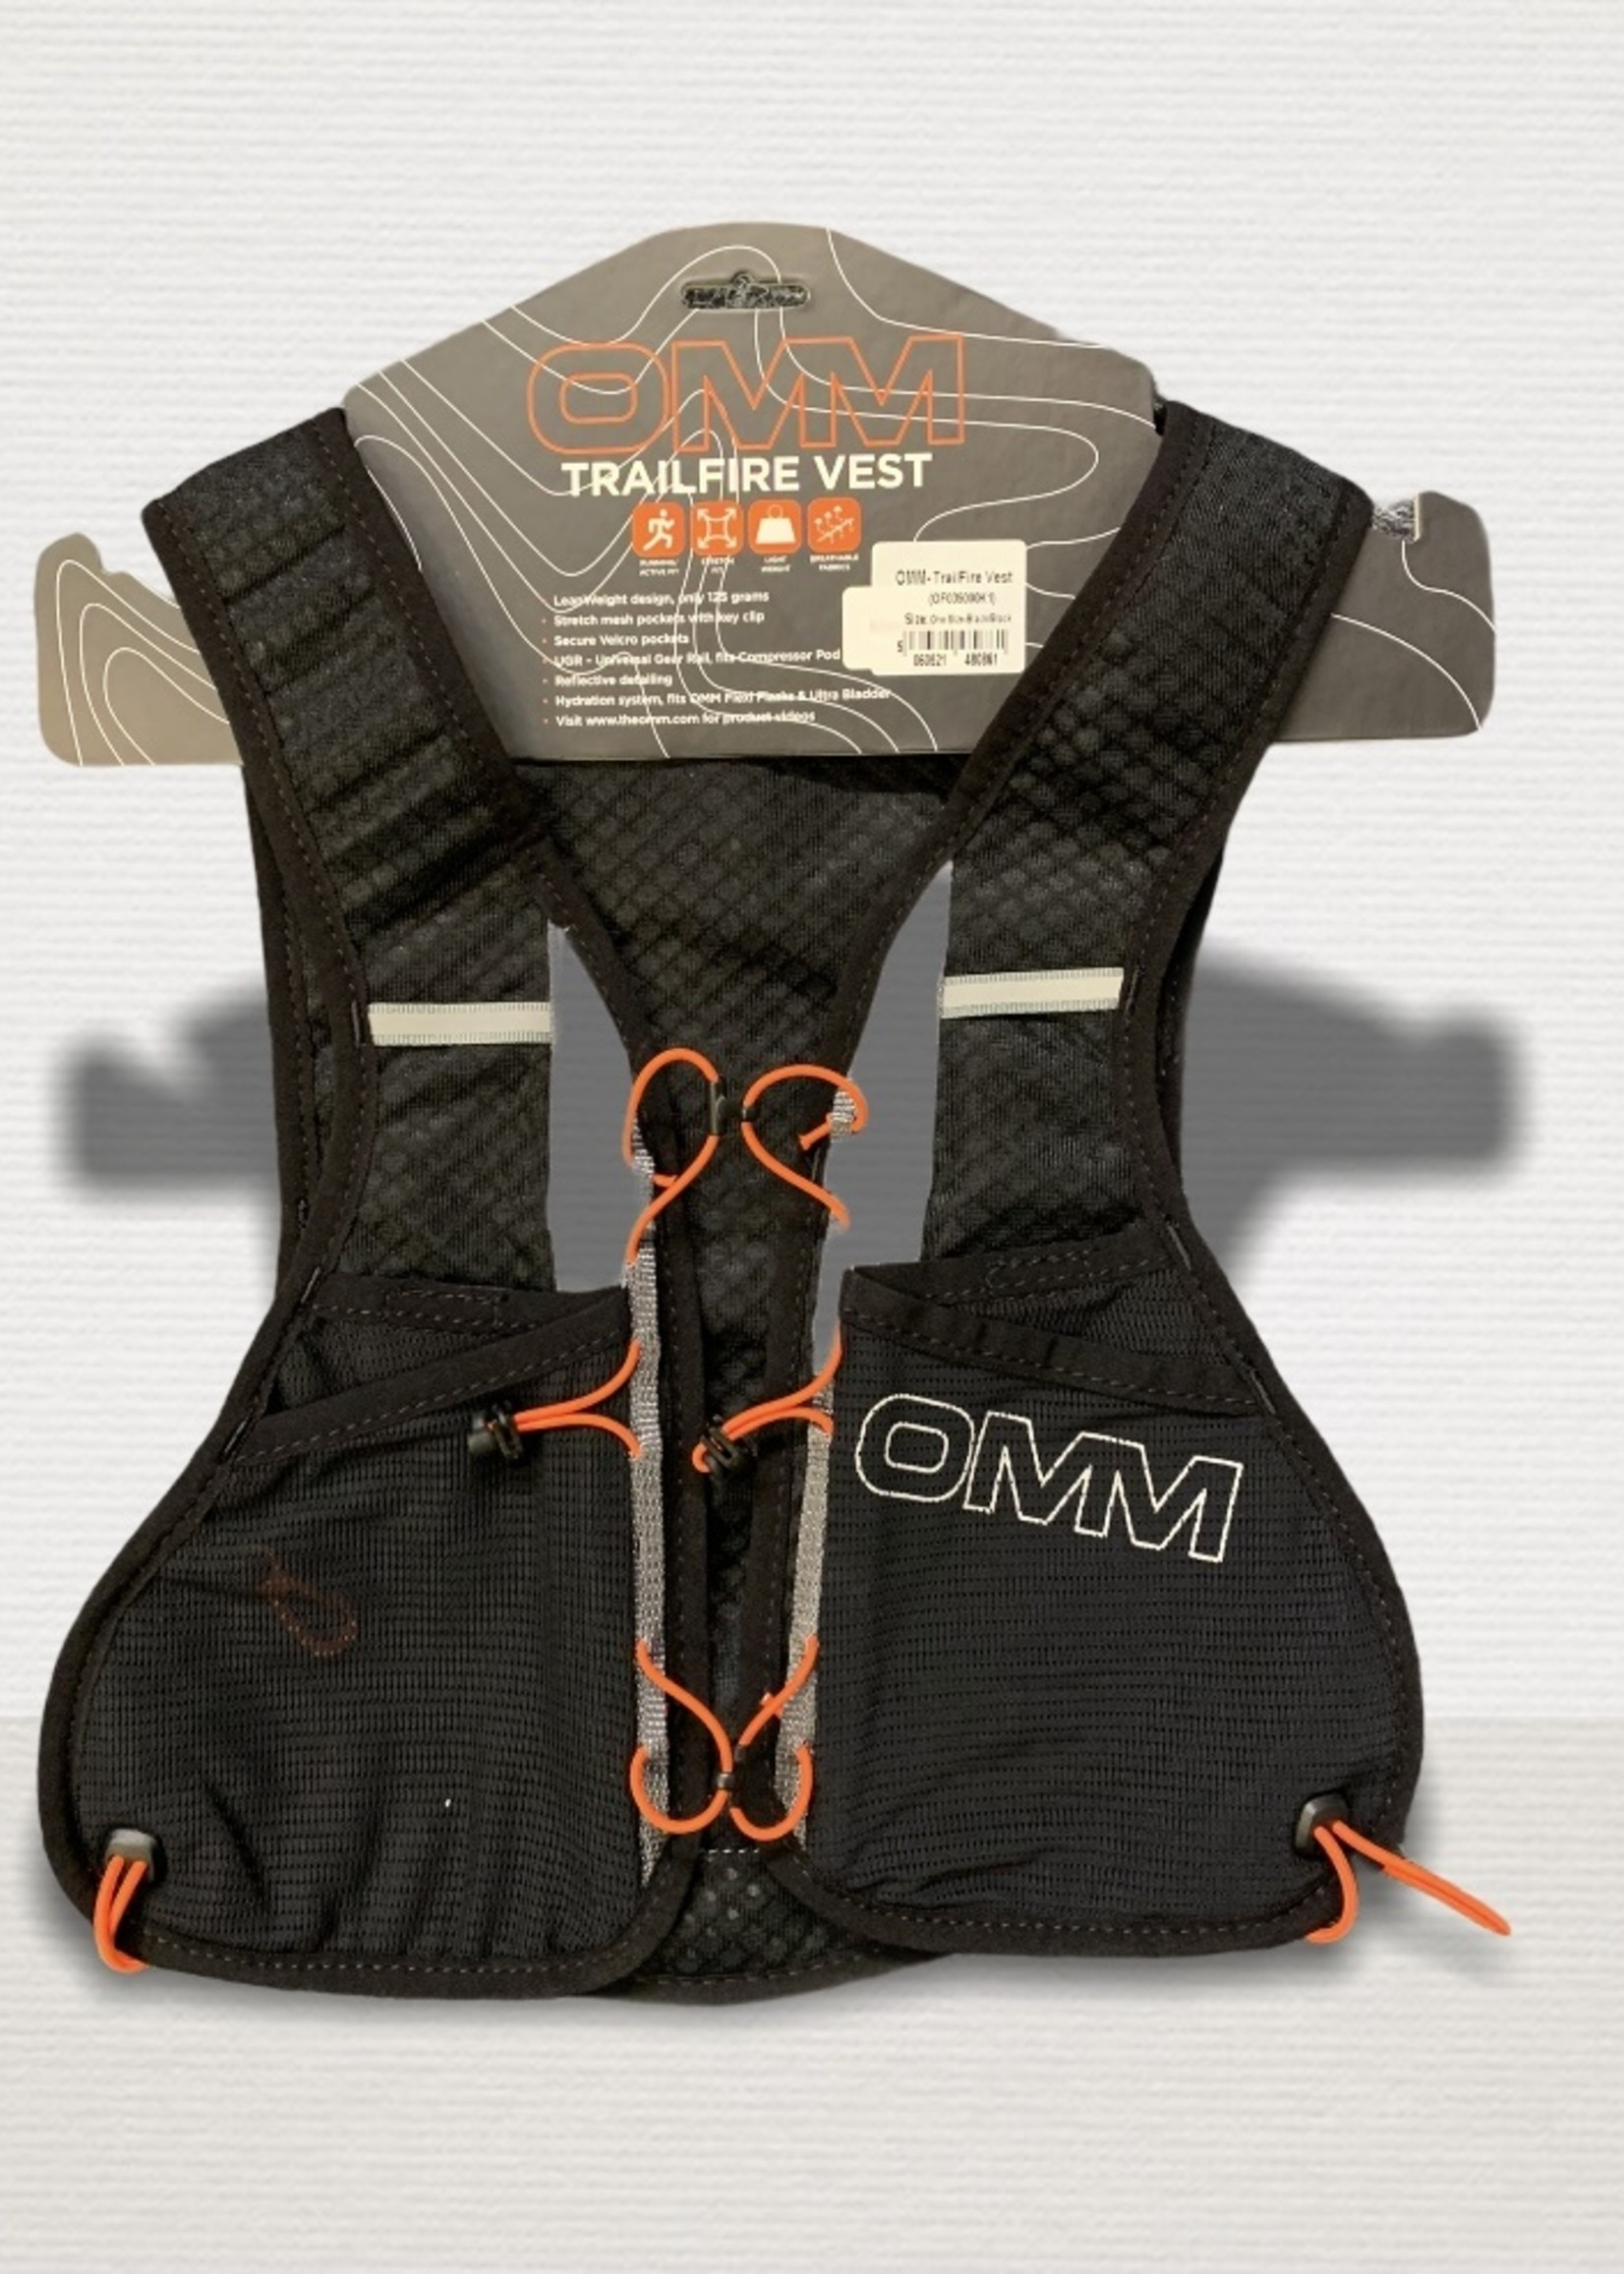 OMM OMM Trail Fire Vest